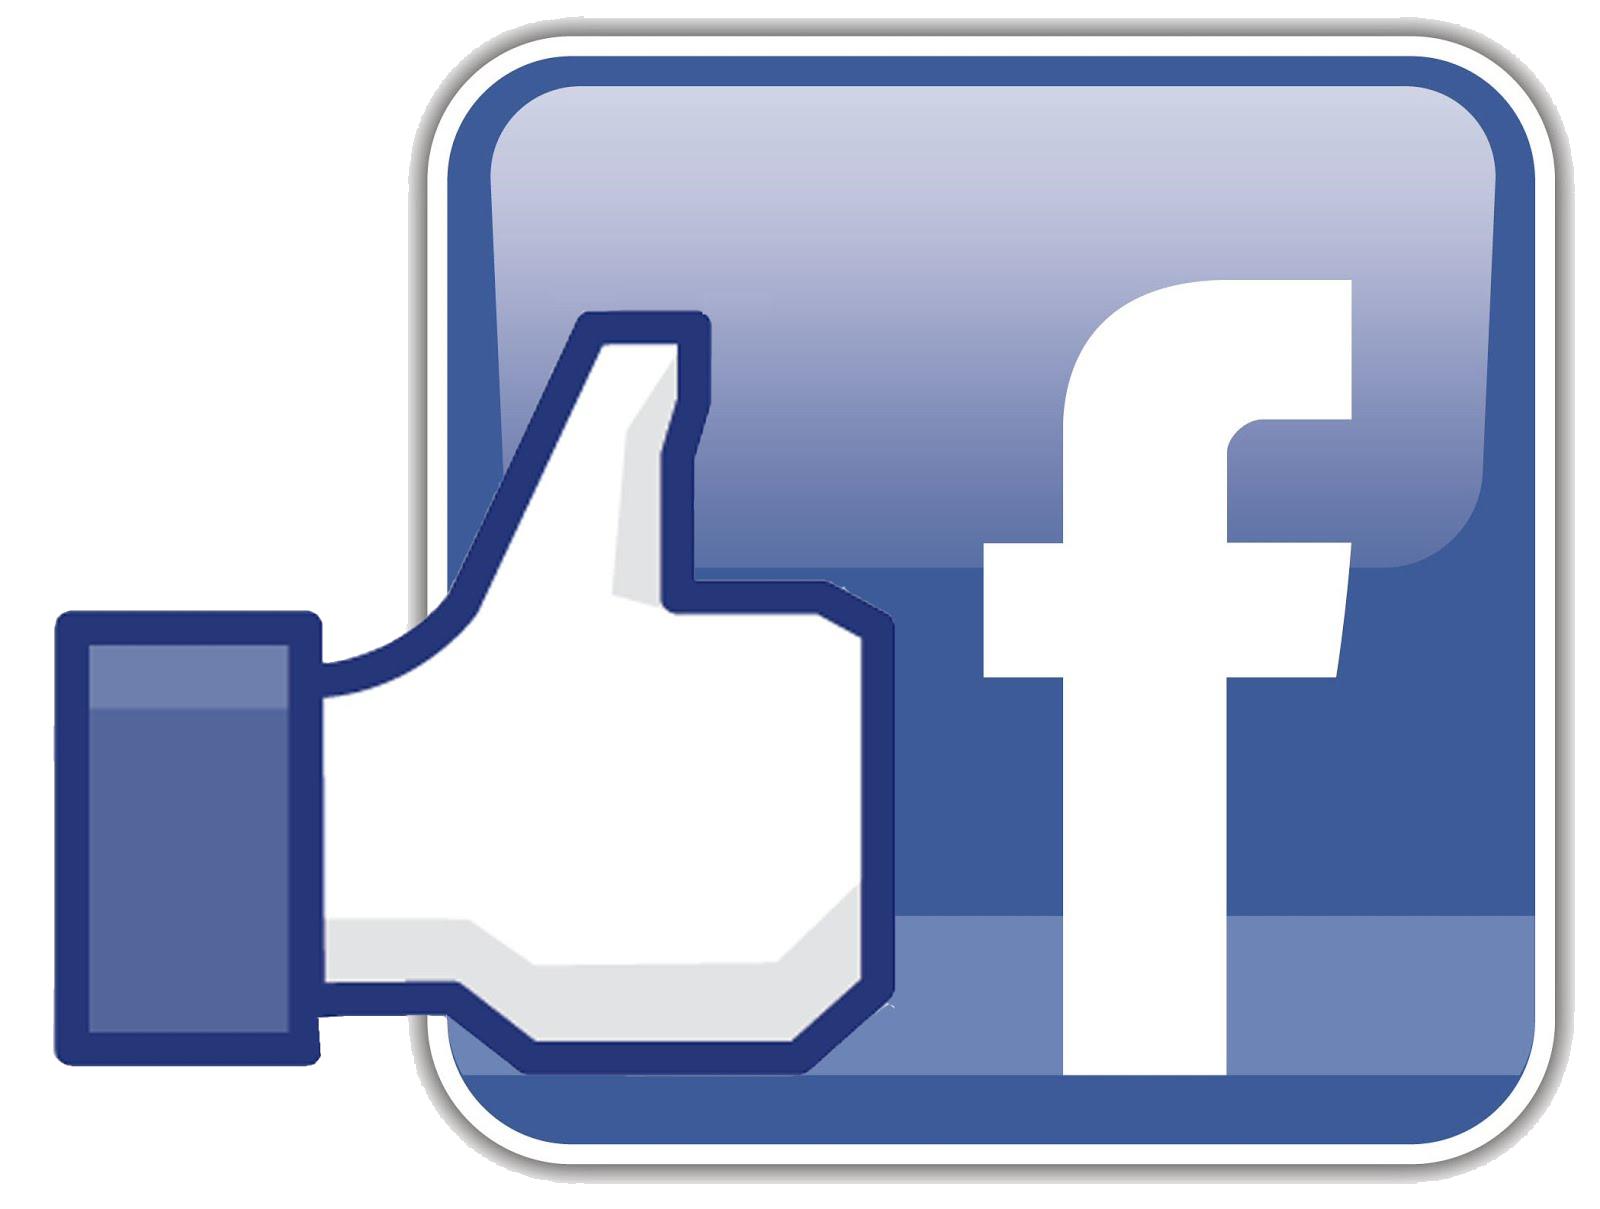 Facebook-logo-png-2-1455538111.png